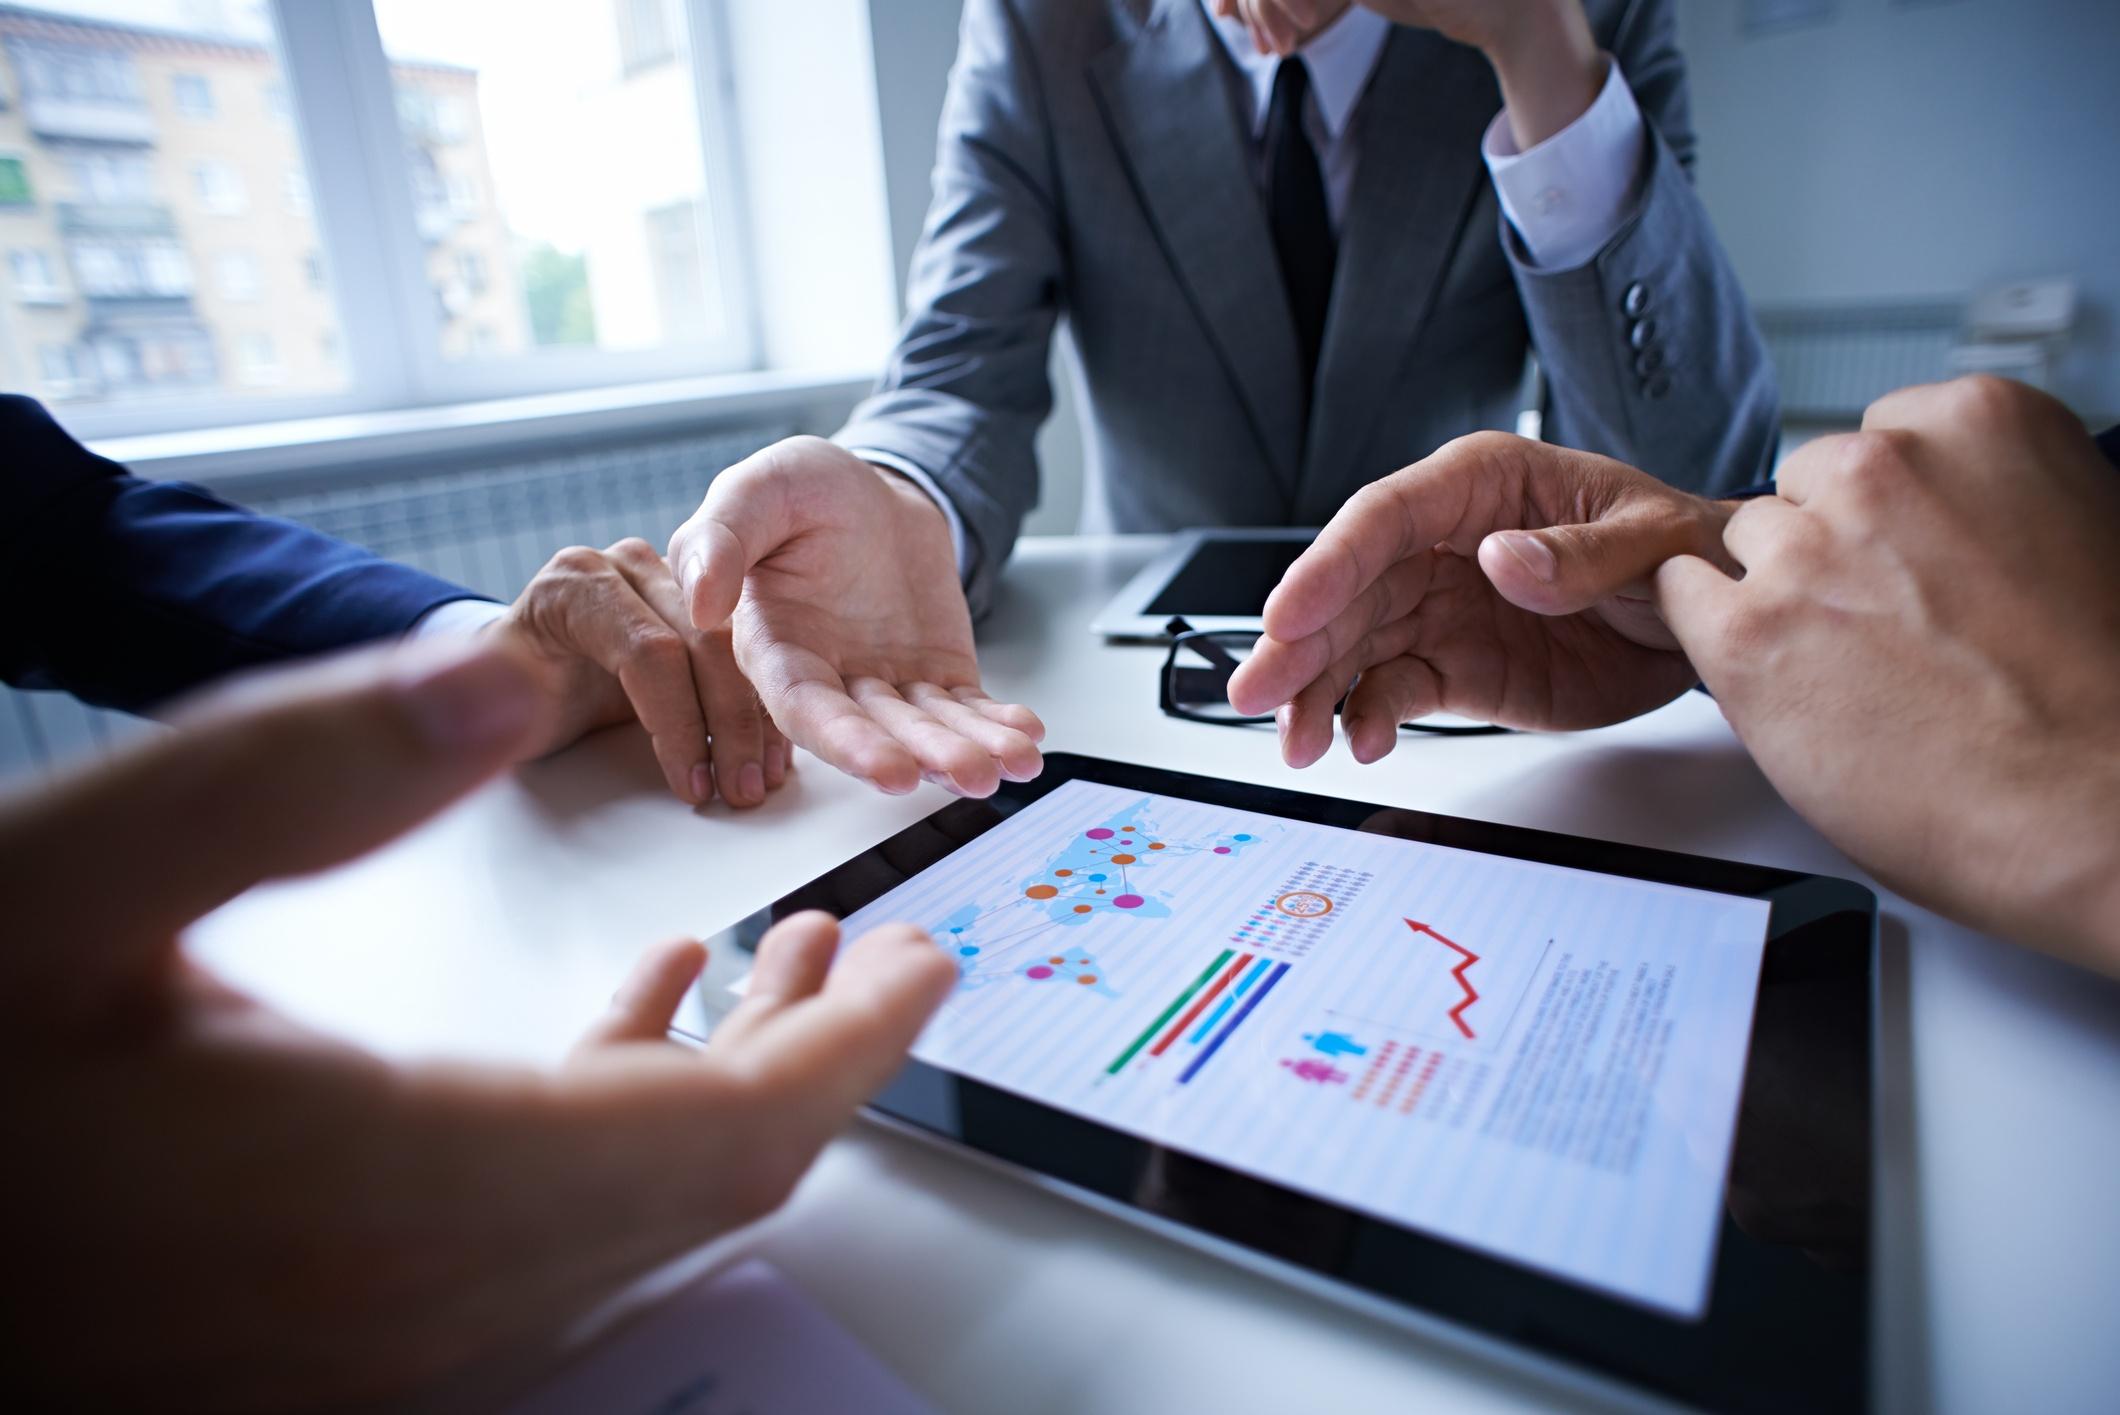 Emblem Portfolios in action -Volatility affords opportunity